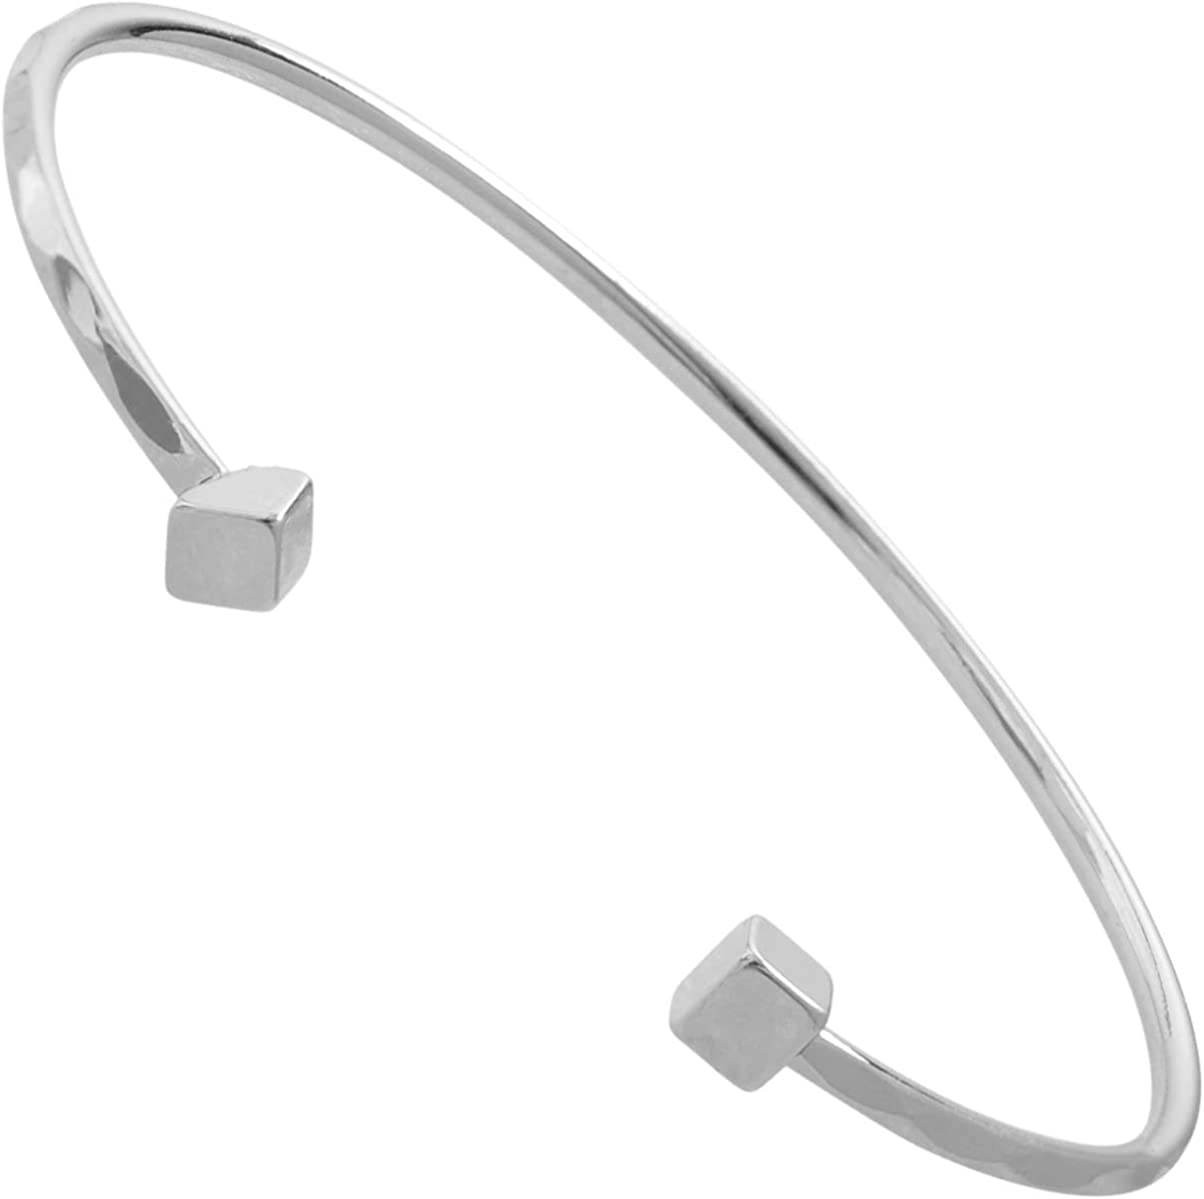 Simple Cuff Hammered Cuff Stacking Cuff Textured Cuff Adjustable Aluminum Cuff Minimalist Cuff Skinny Silver Textured Cuff